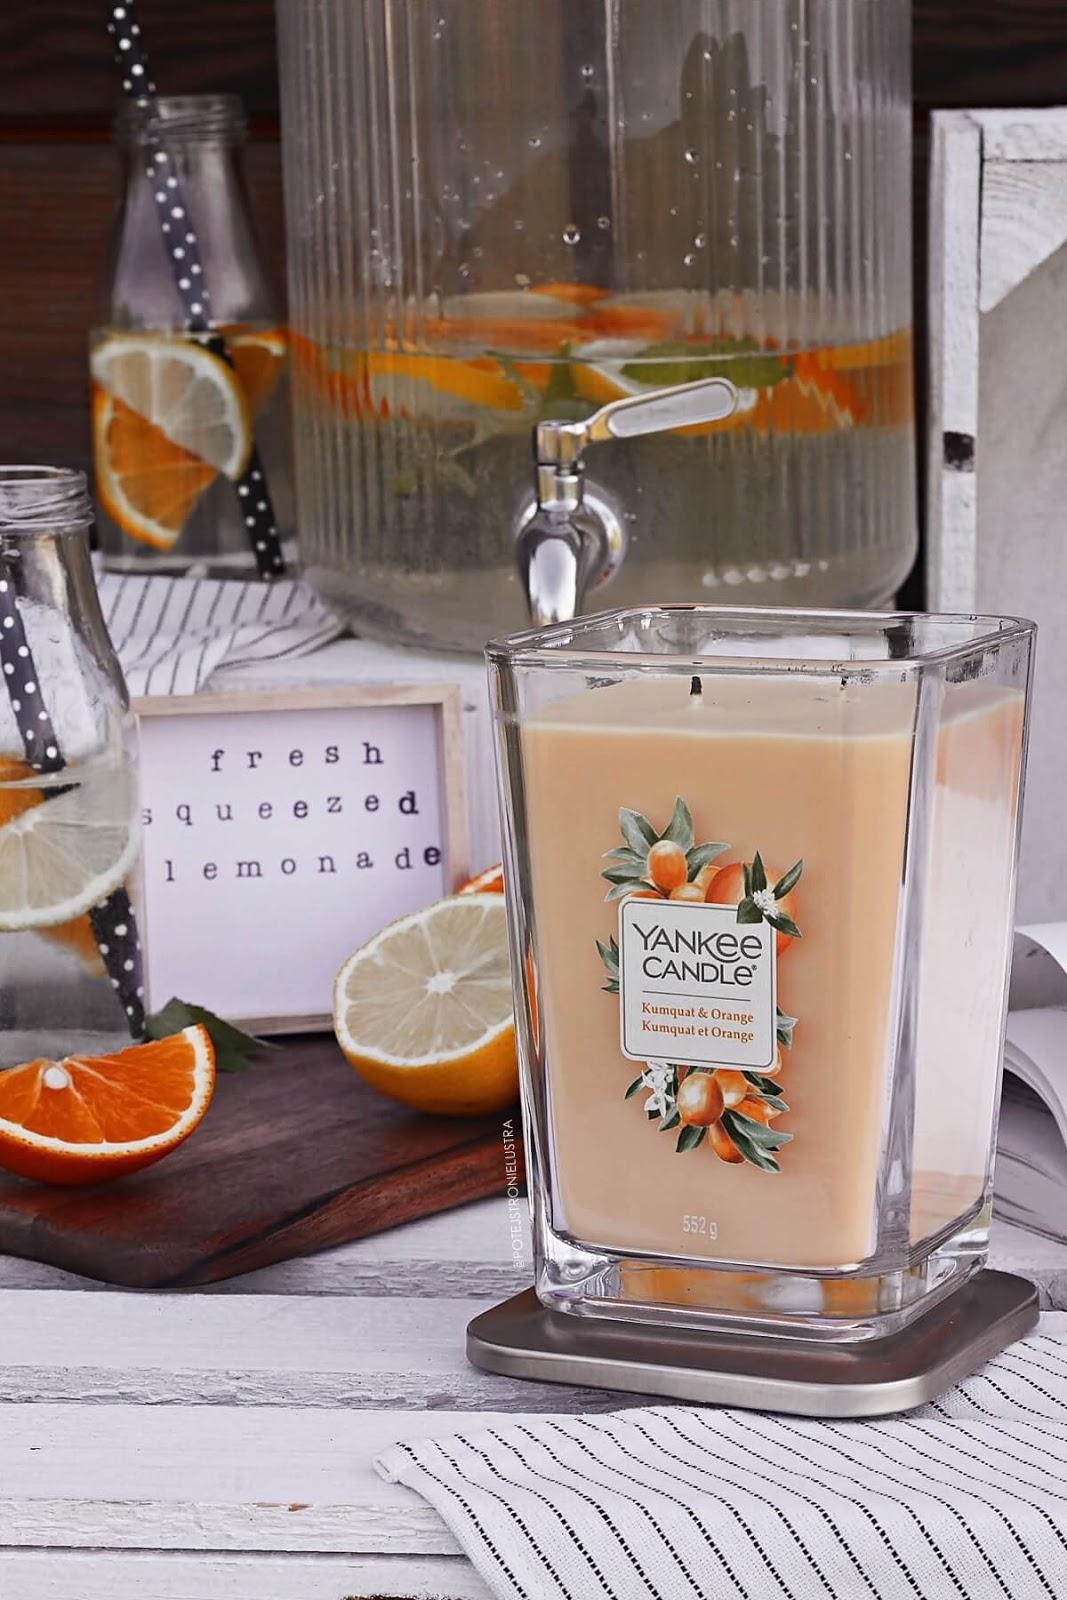 nowy zapach yankee candle kumquat & orange na lato 2020